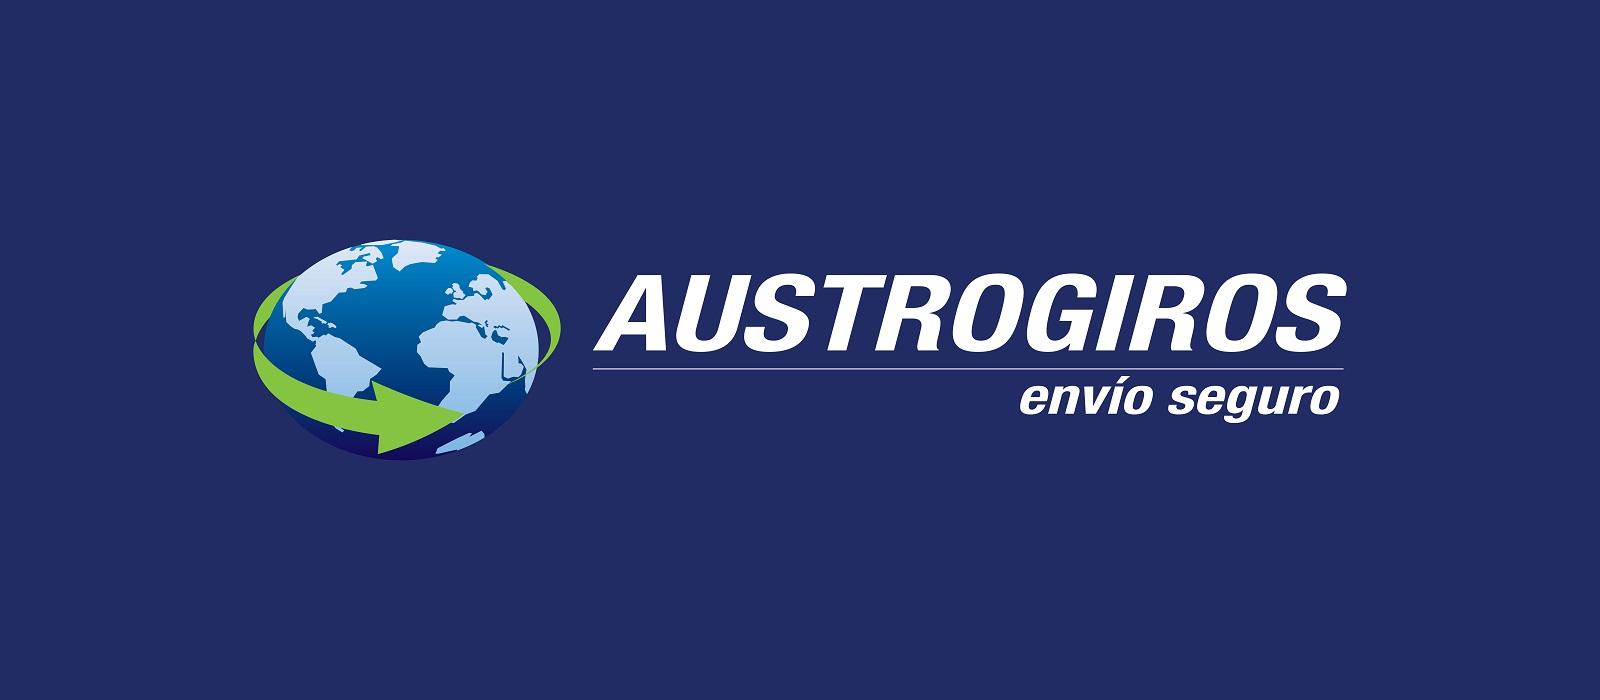 LOGO-Austrogiros-web